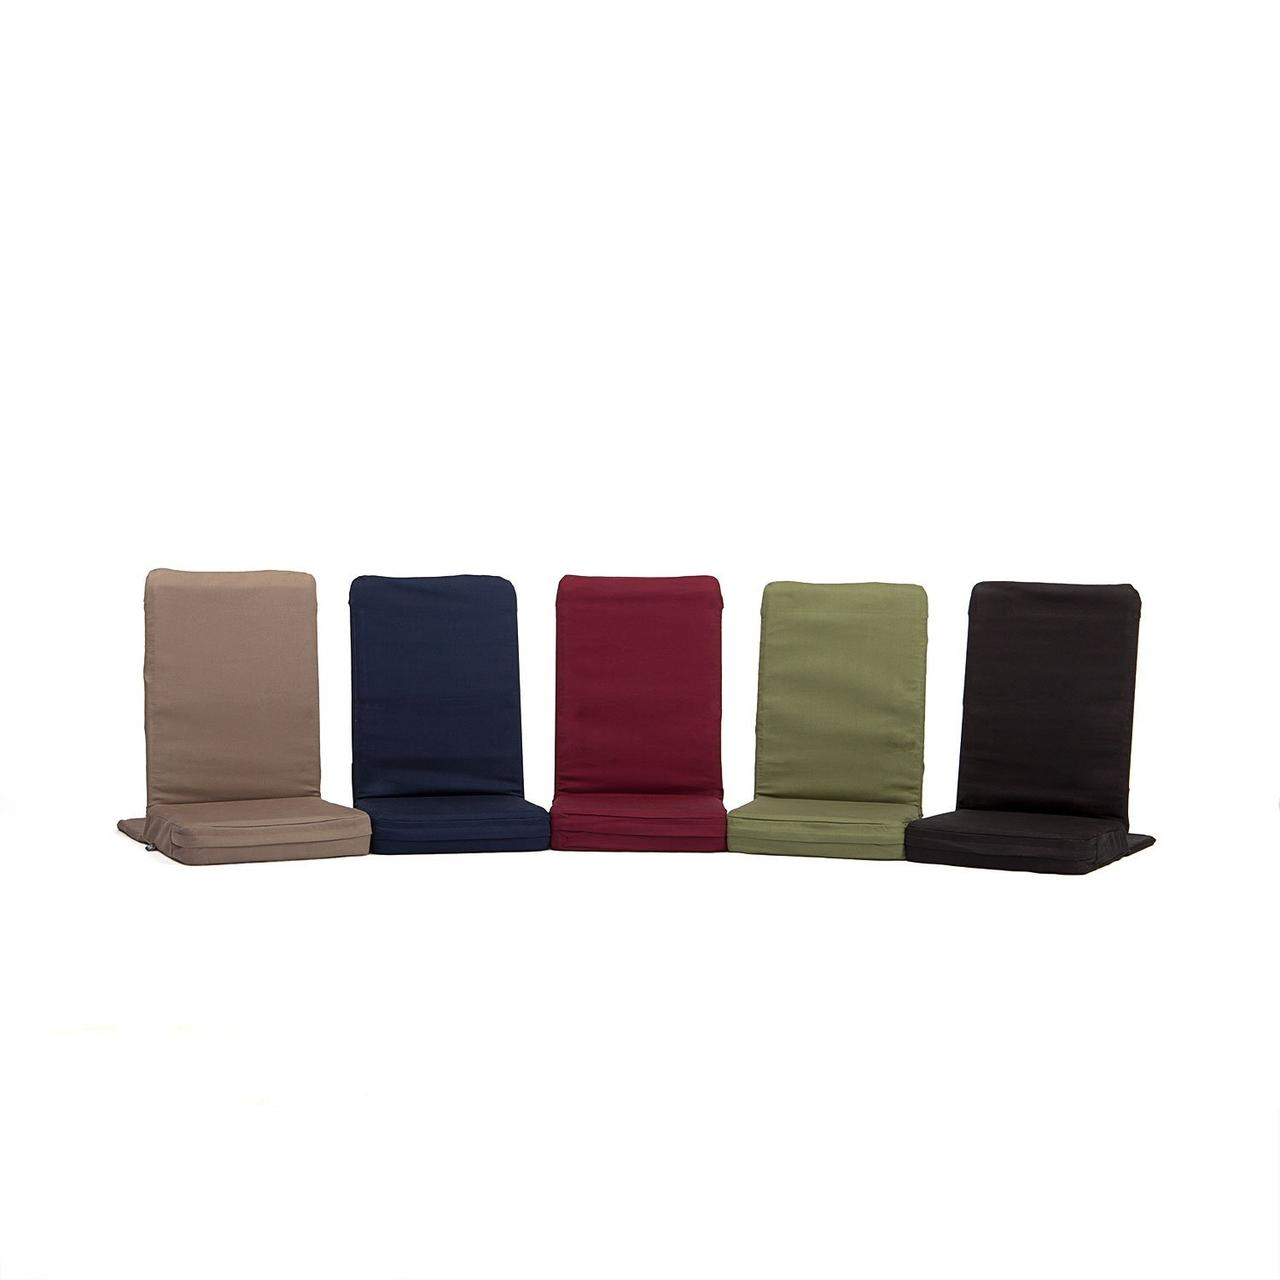 Кресло/стул для медитации Bodhi. Кресло для медитации Bodhi. - фото 5